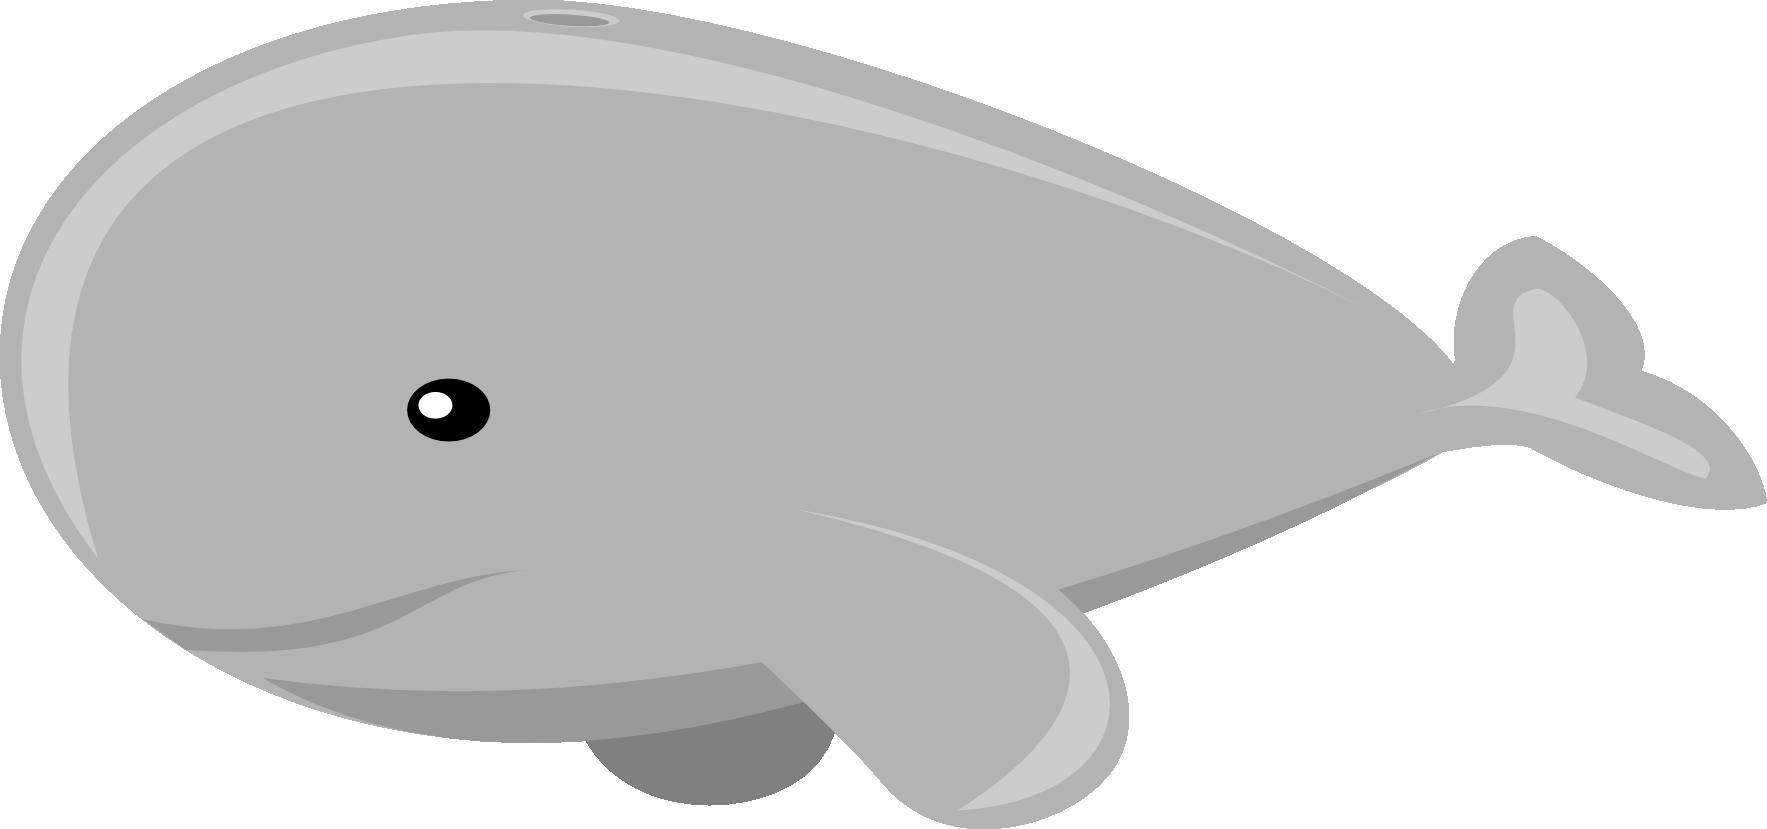 Mixed clip art stormdesignz. Clipart whale transparent background